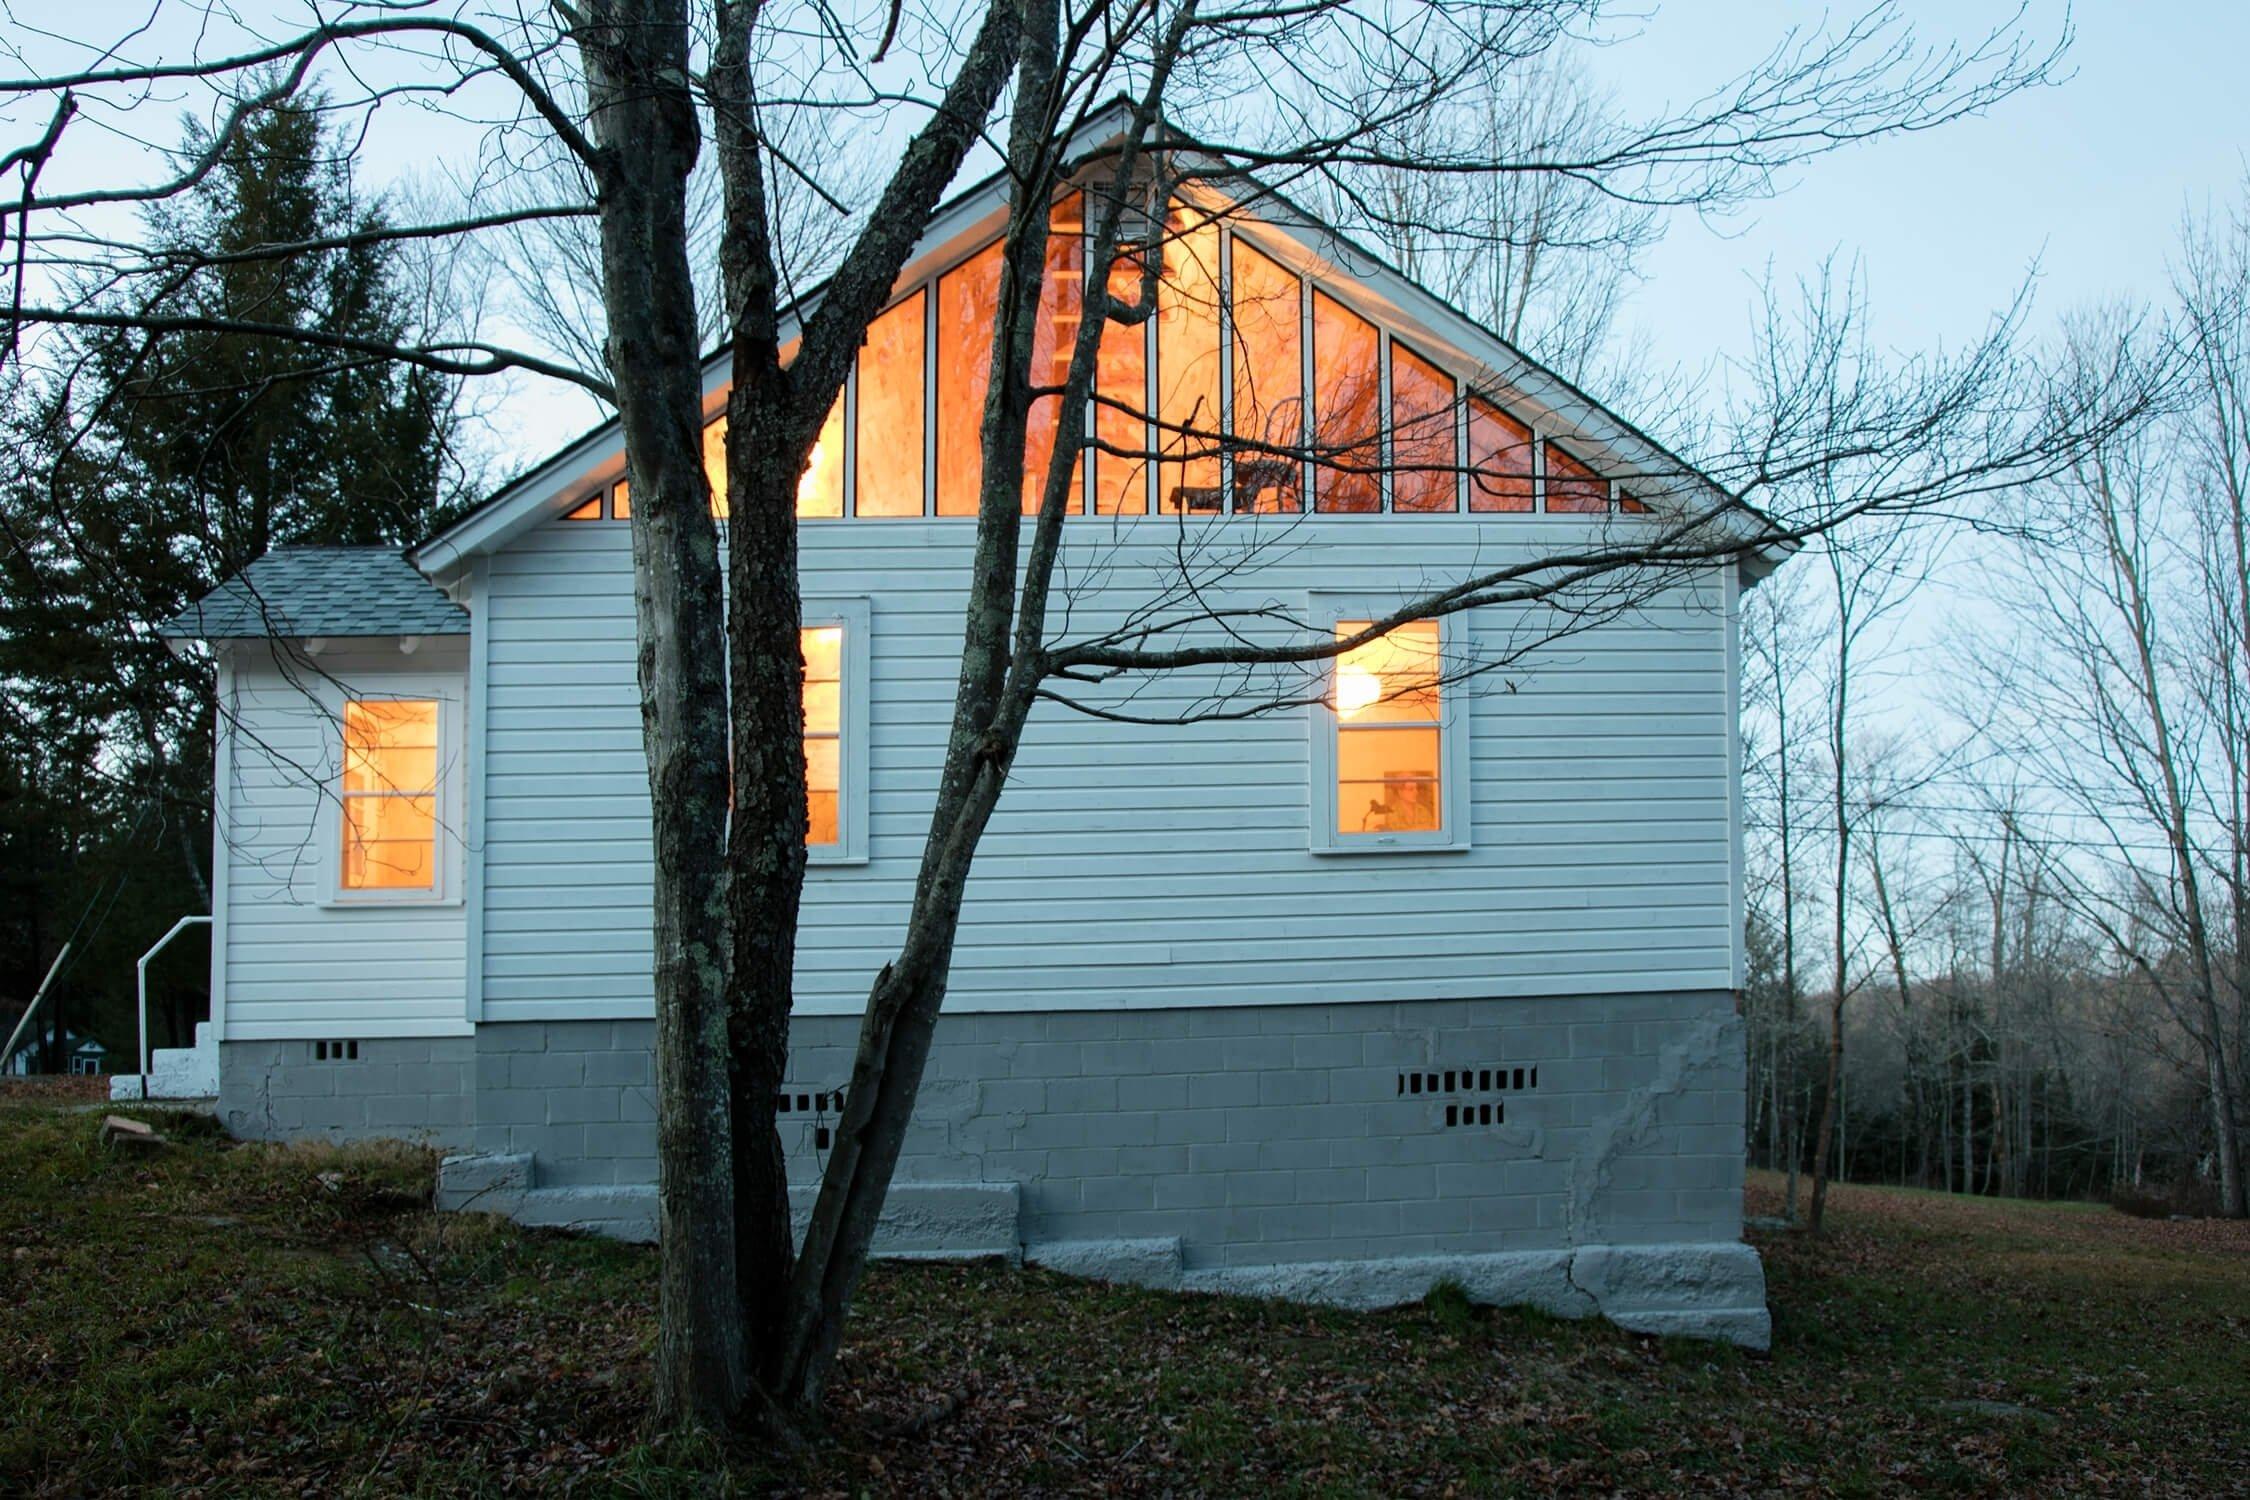 10 Most Popular Upstate New York Vacation Ideas interior design ideas catskills ny glen wilde mountaindale wrk 2020